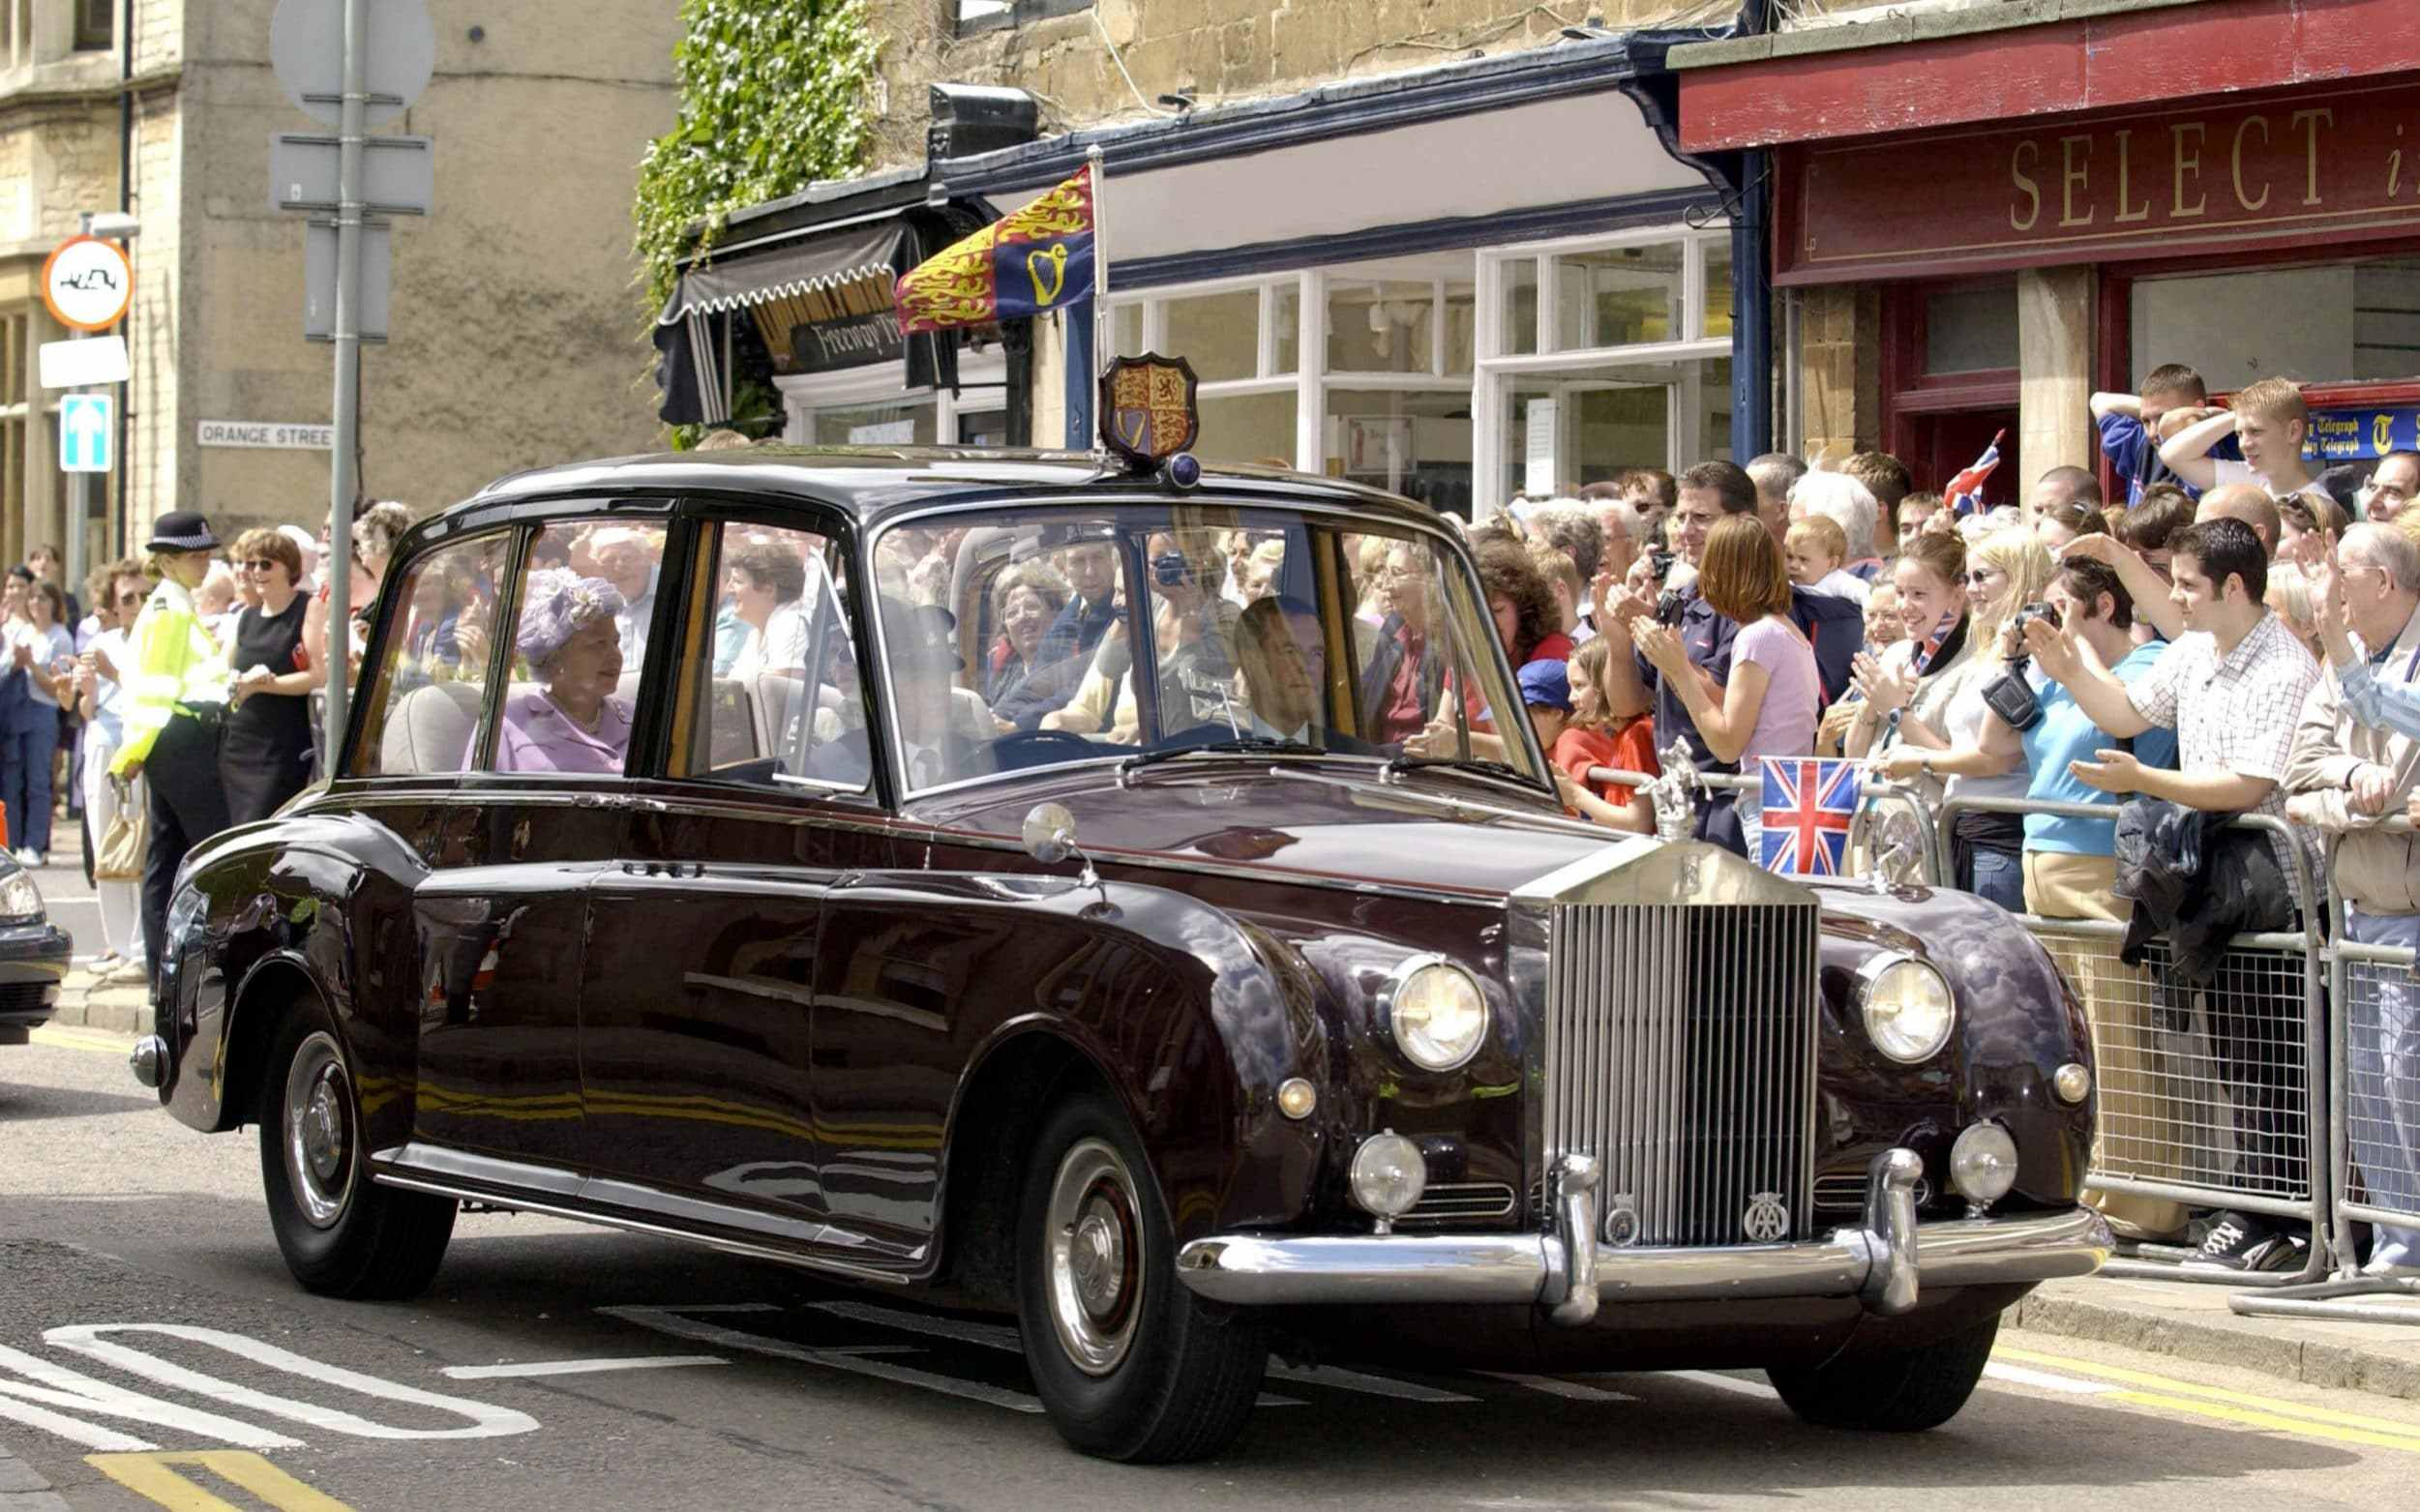 nữ hoàng Elizabeth ngồi trong Rolls Royce Phantom IV